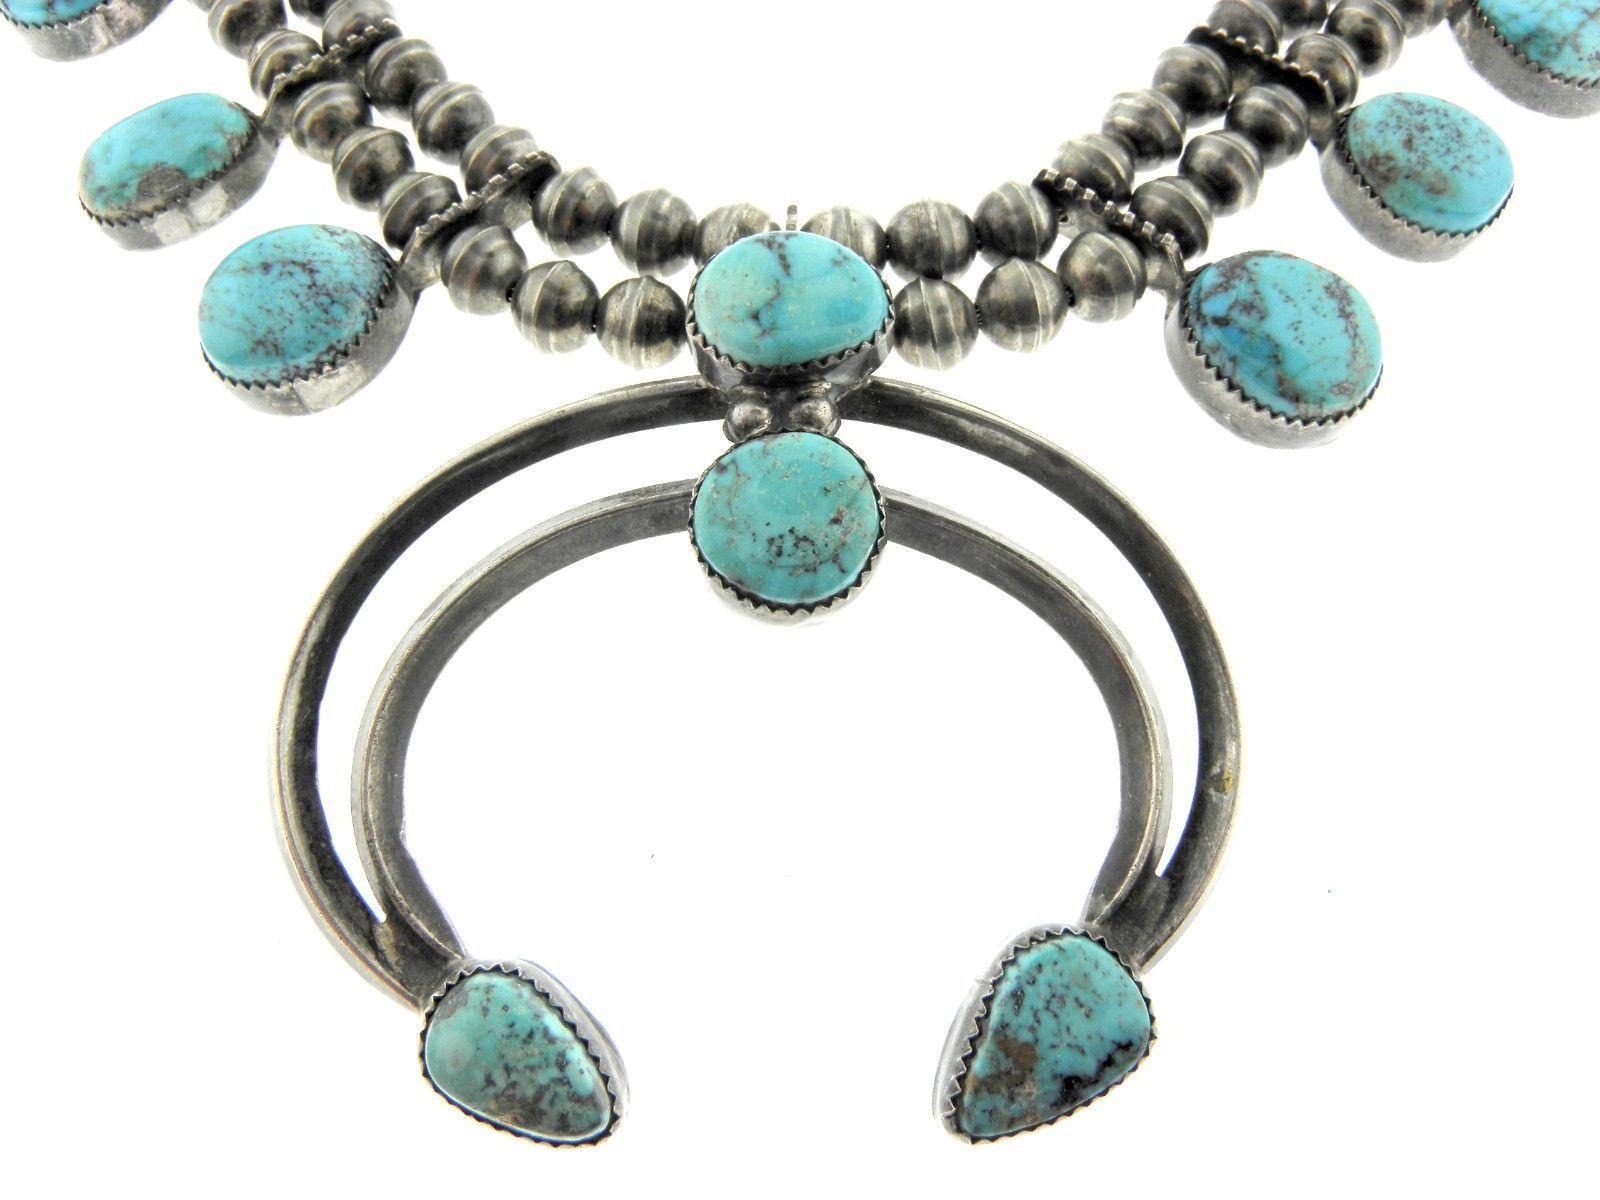 Handmade Navajo Tony Guerro Sterling Silver Amp Turquoise Squash Blossom Necklace | eBay